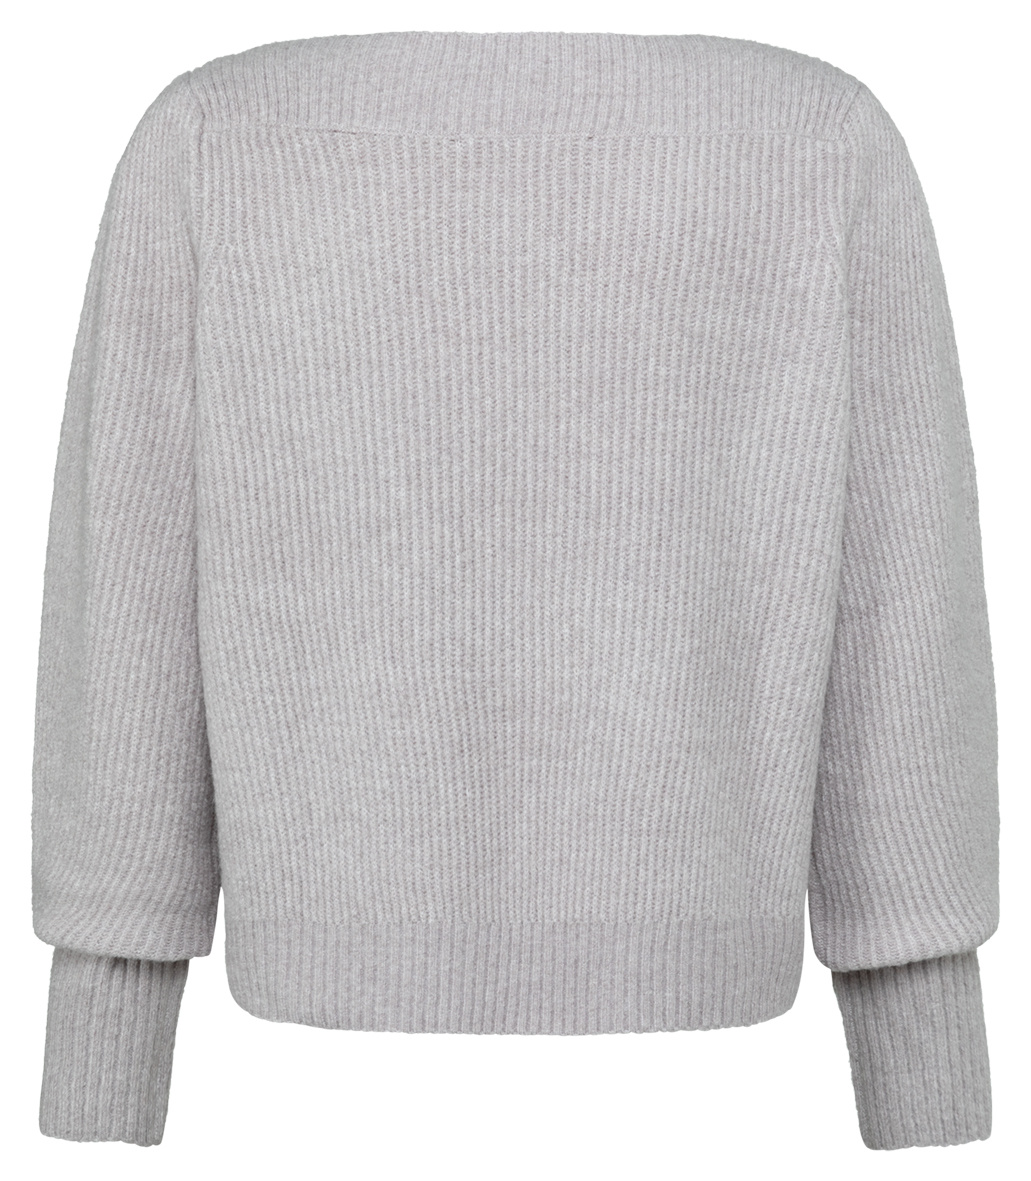 yaya Boatneck sweater lon 1000485-123-1